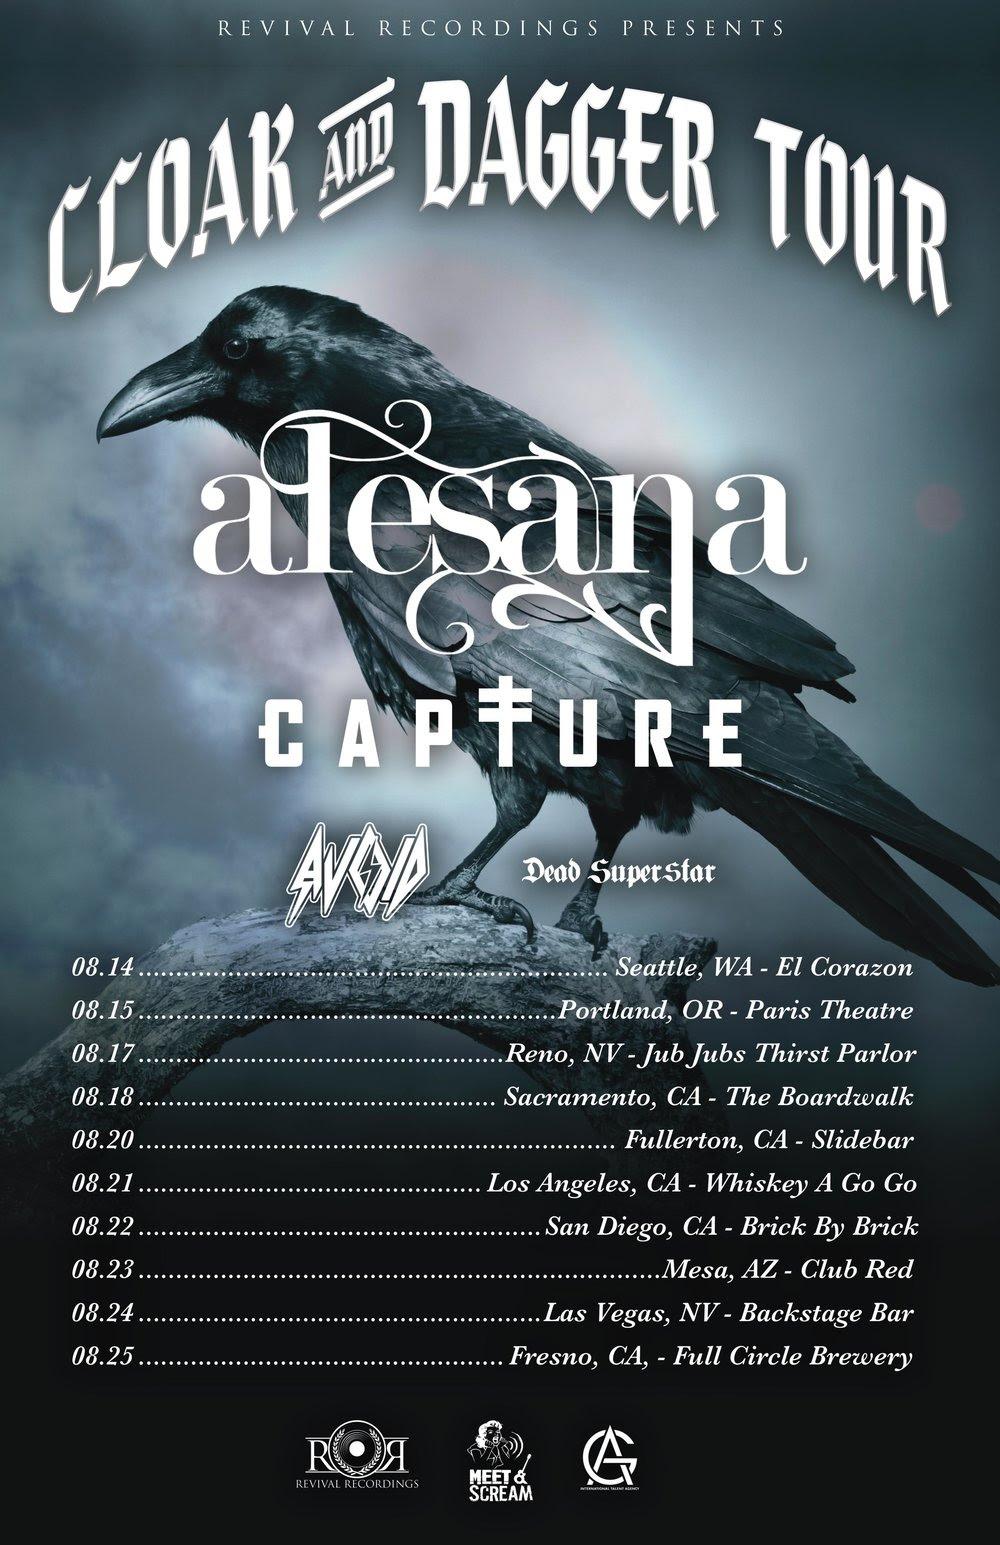 Alesana - Tour Dates